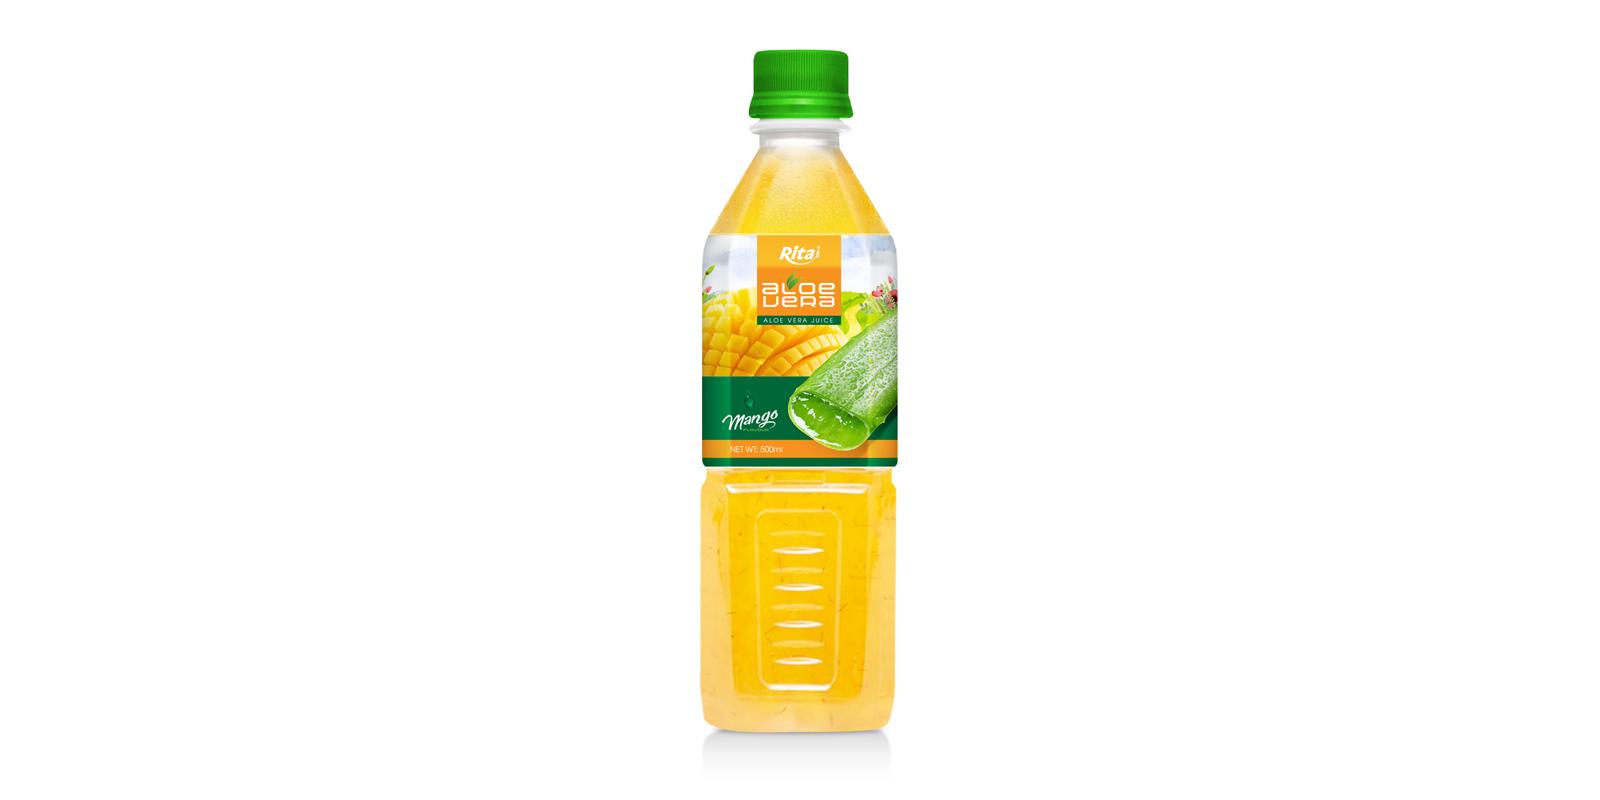 Aloe vera with mango juice 500ml Pet bottle